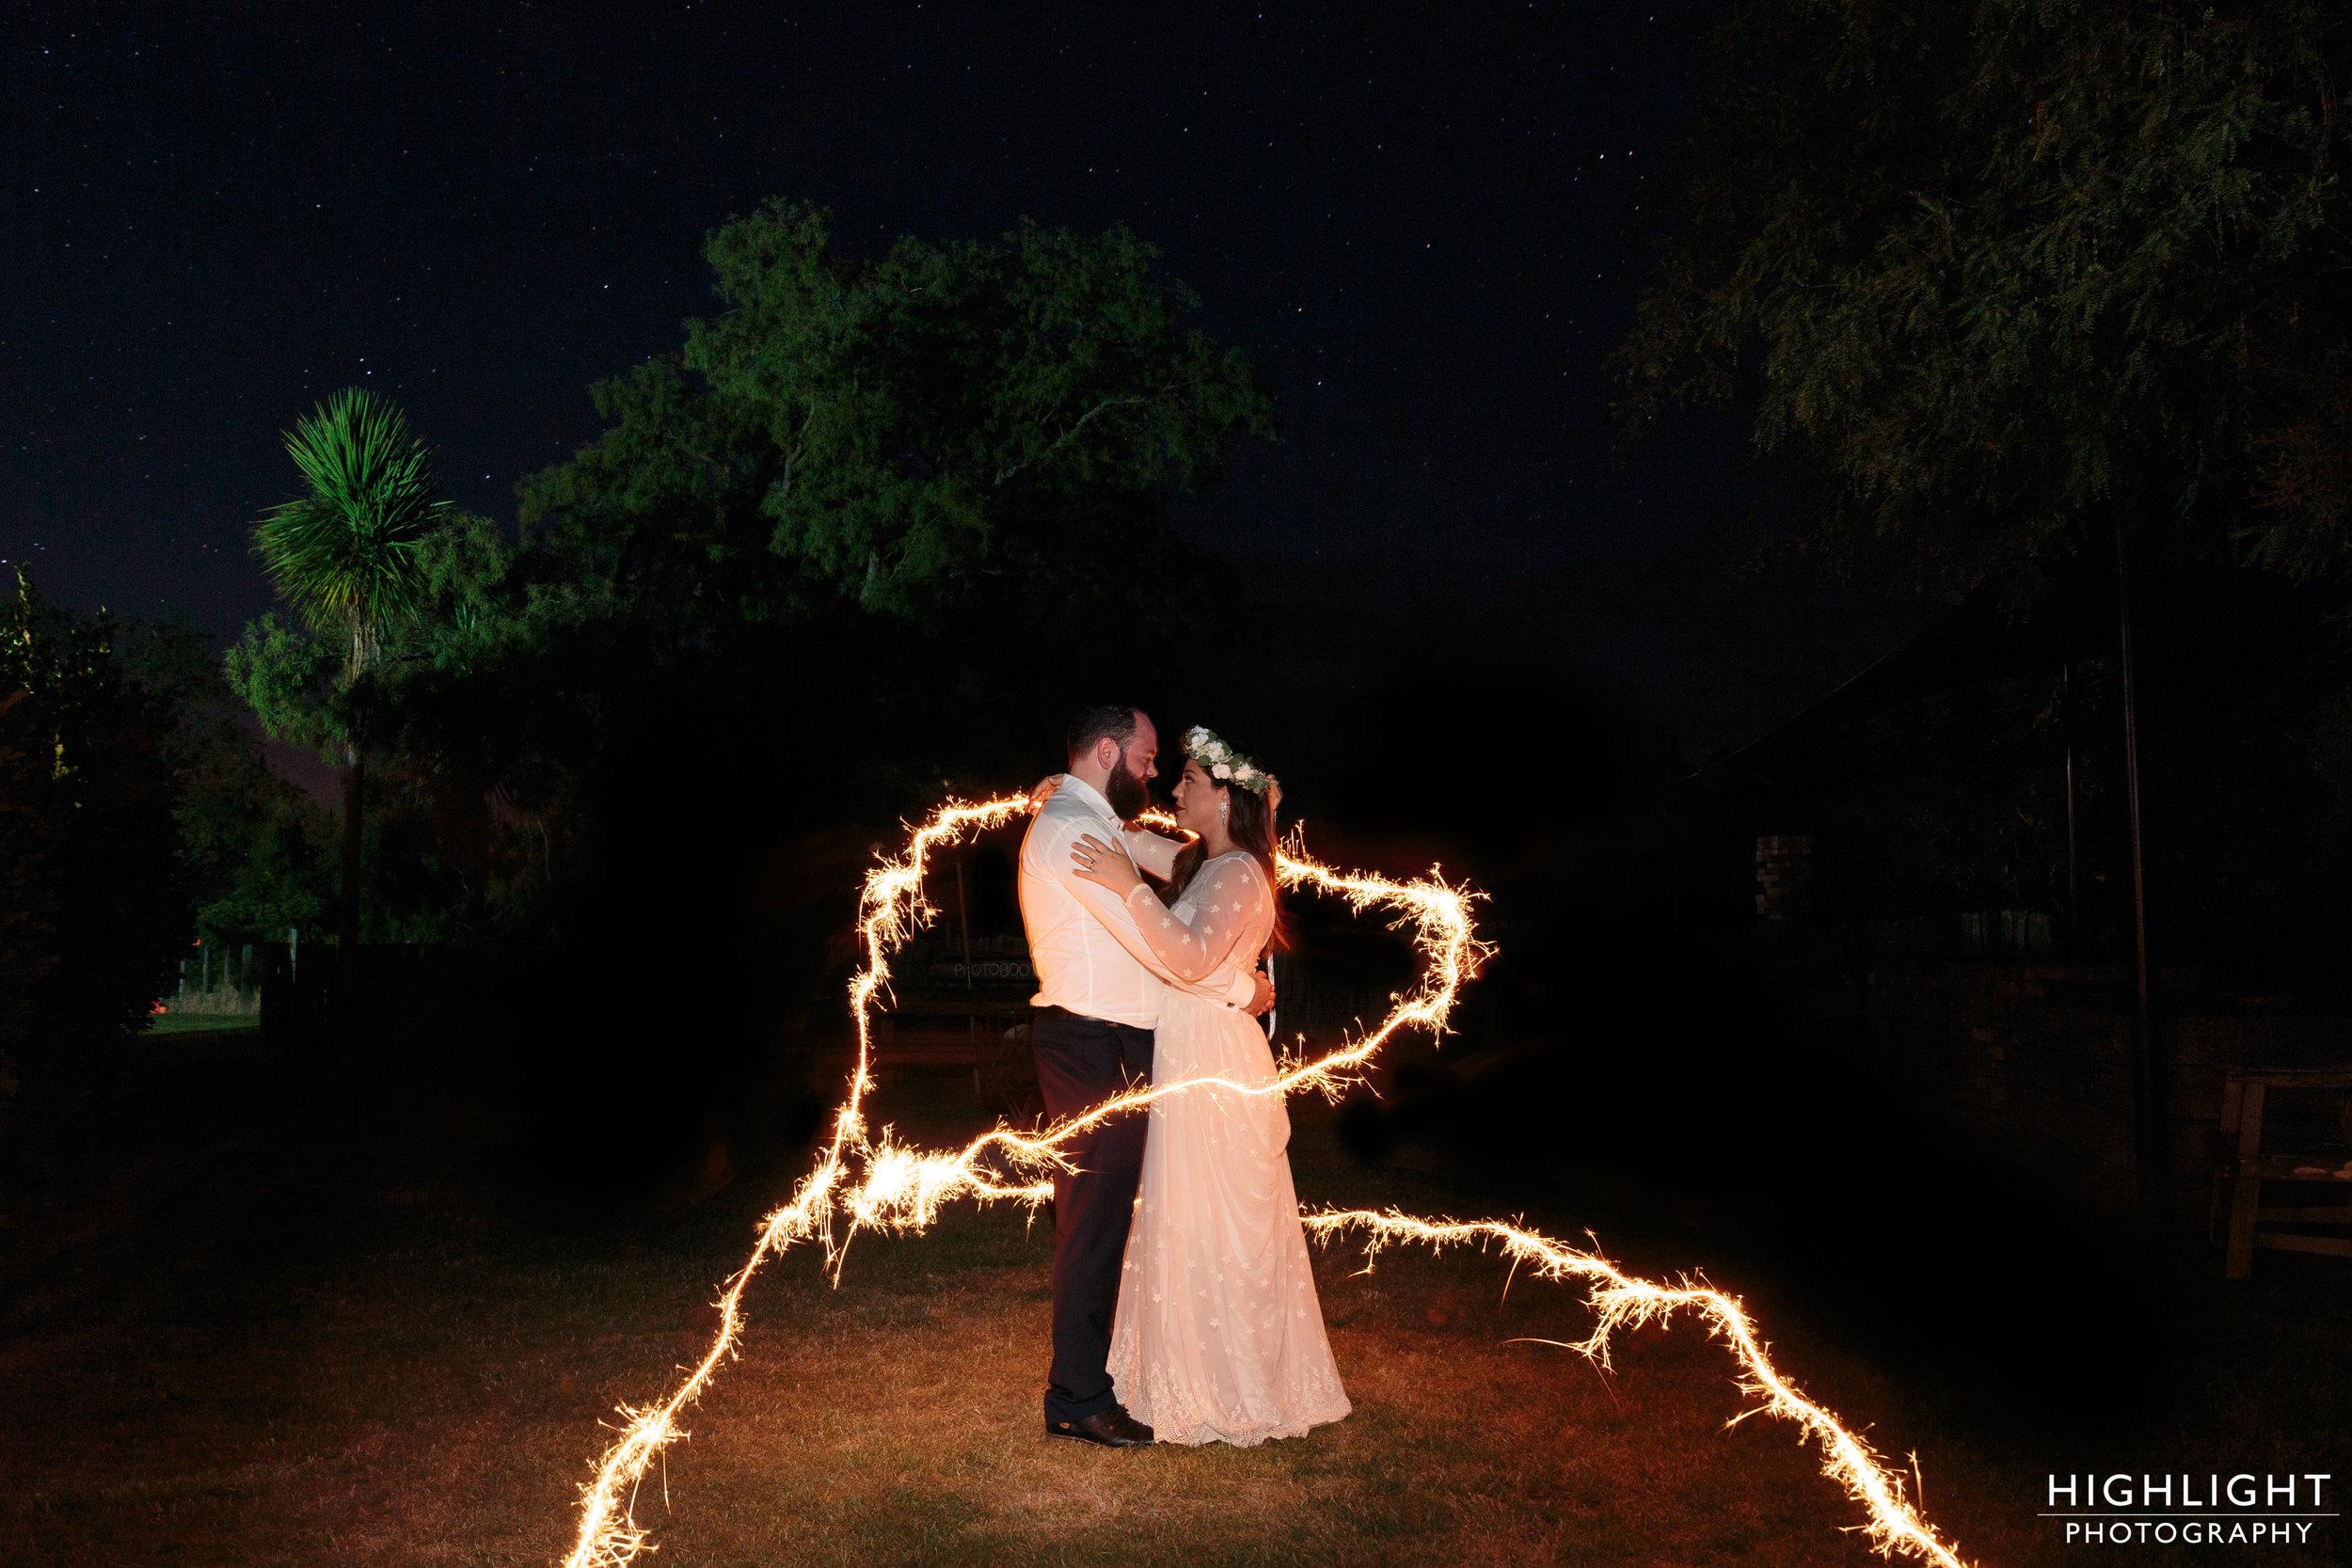 highlight-wedding-photography-new-zealand-makoura-lodge-wedding-197.jpg